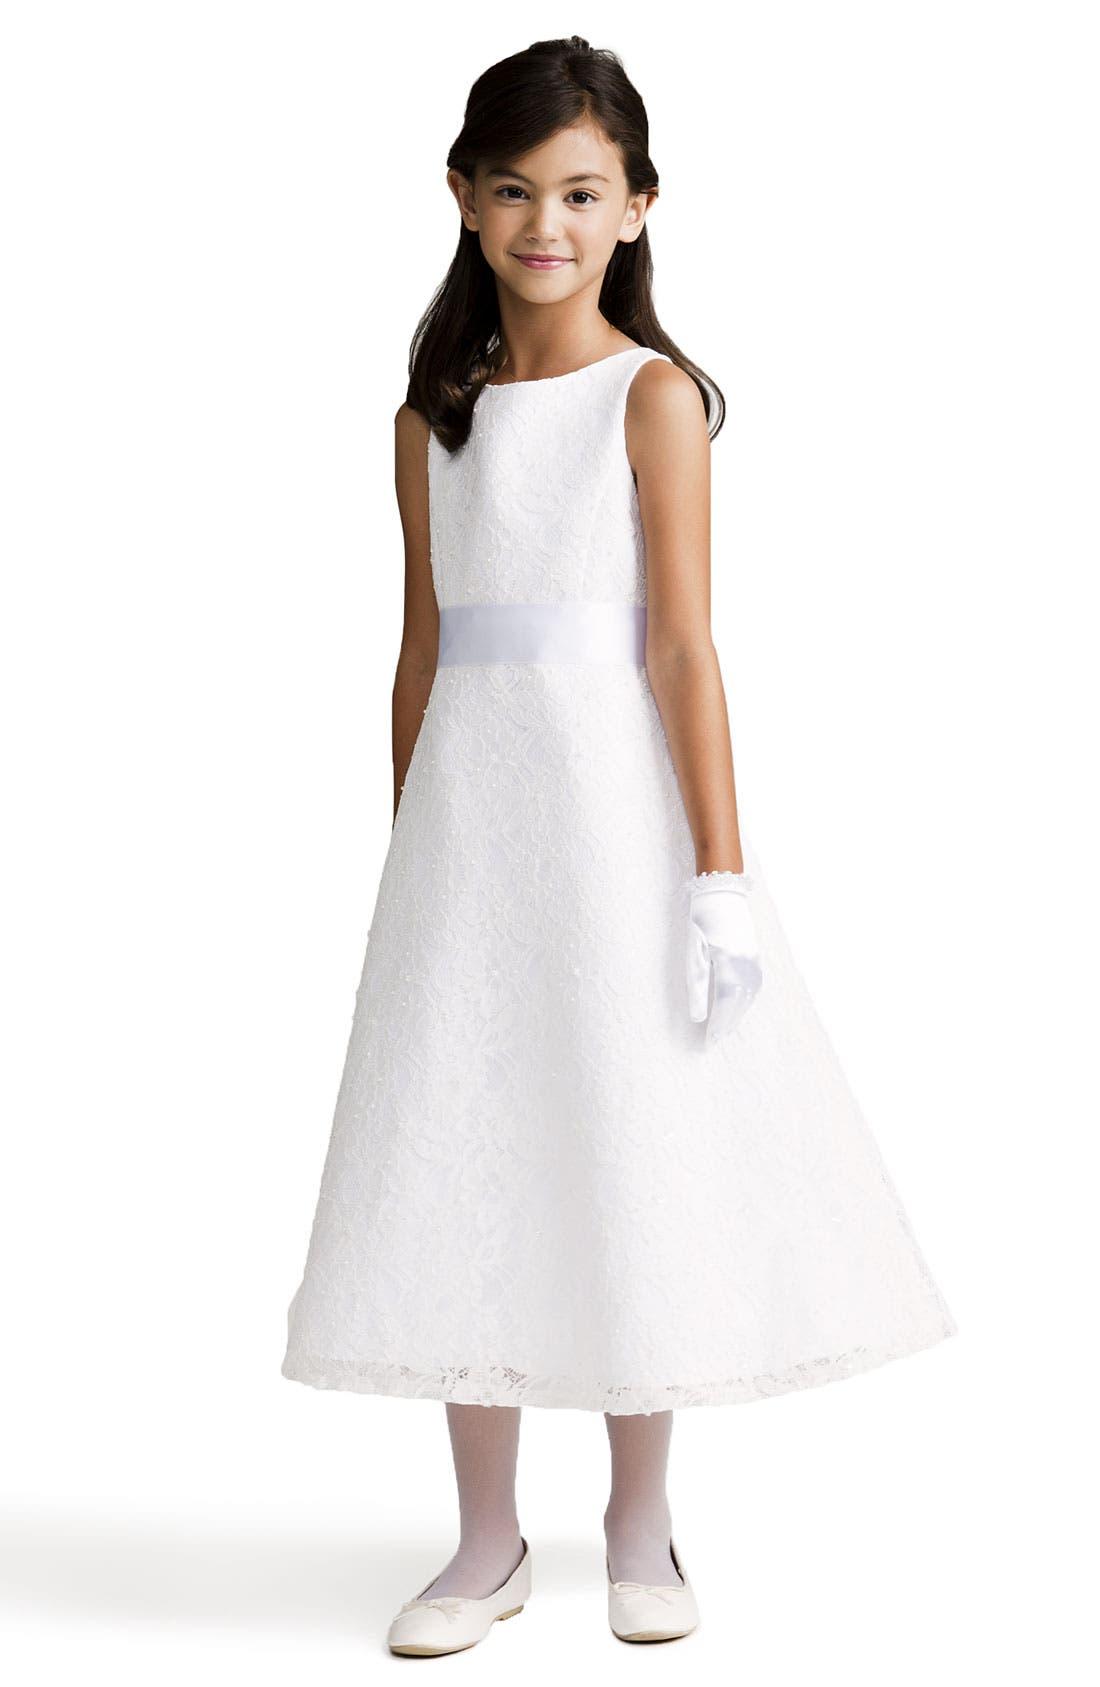 Main Image - Us Angels Beaded Lace Sleeveless Dress (Big Girls)